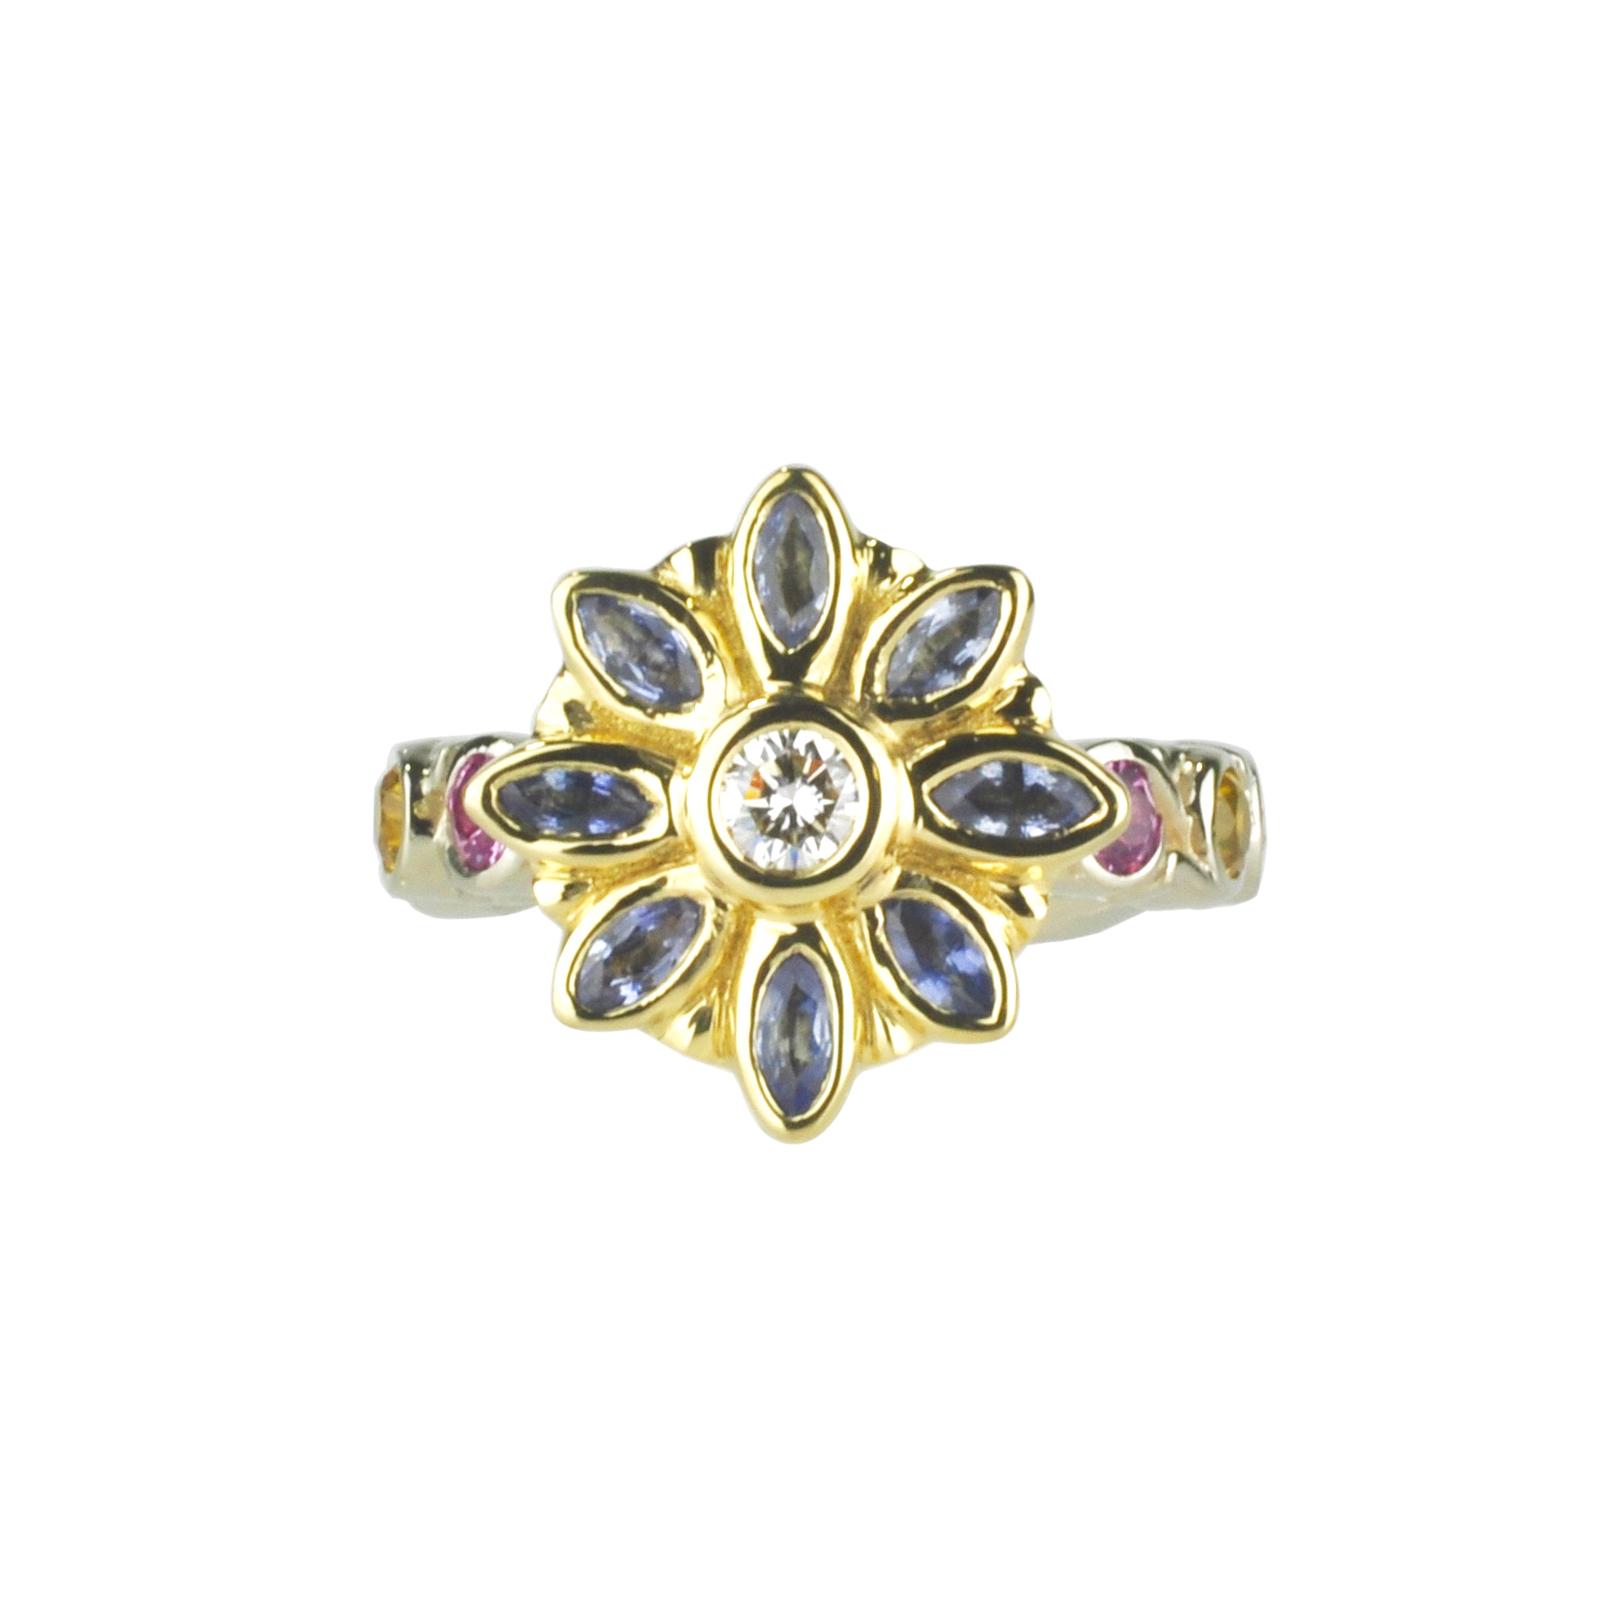 Sapphire and Diamond Flower Ring by Waylon Rhoads Jewelry